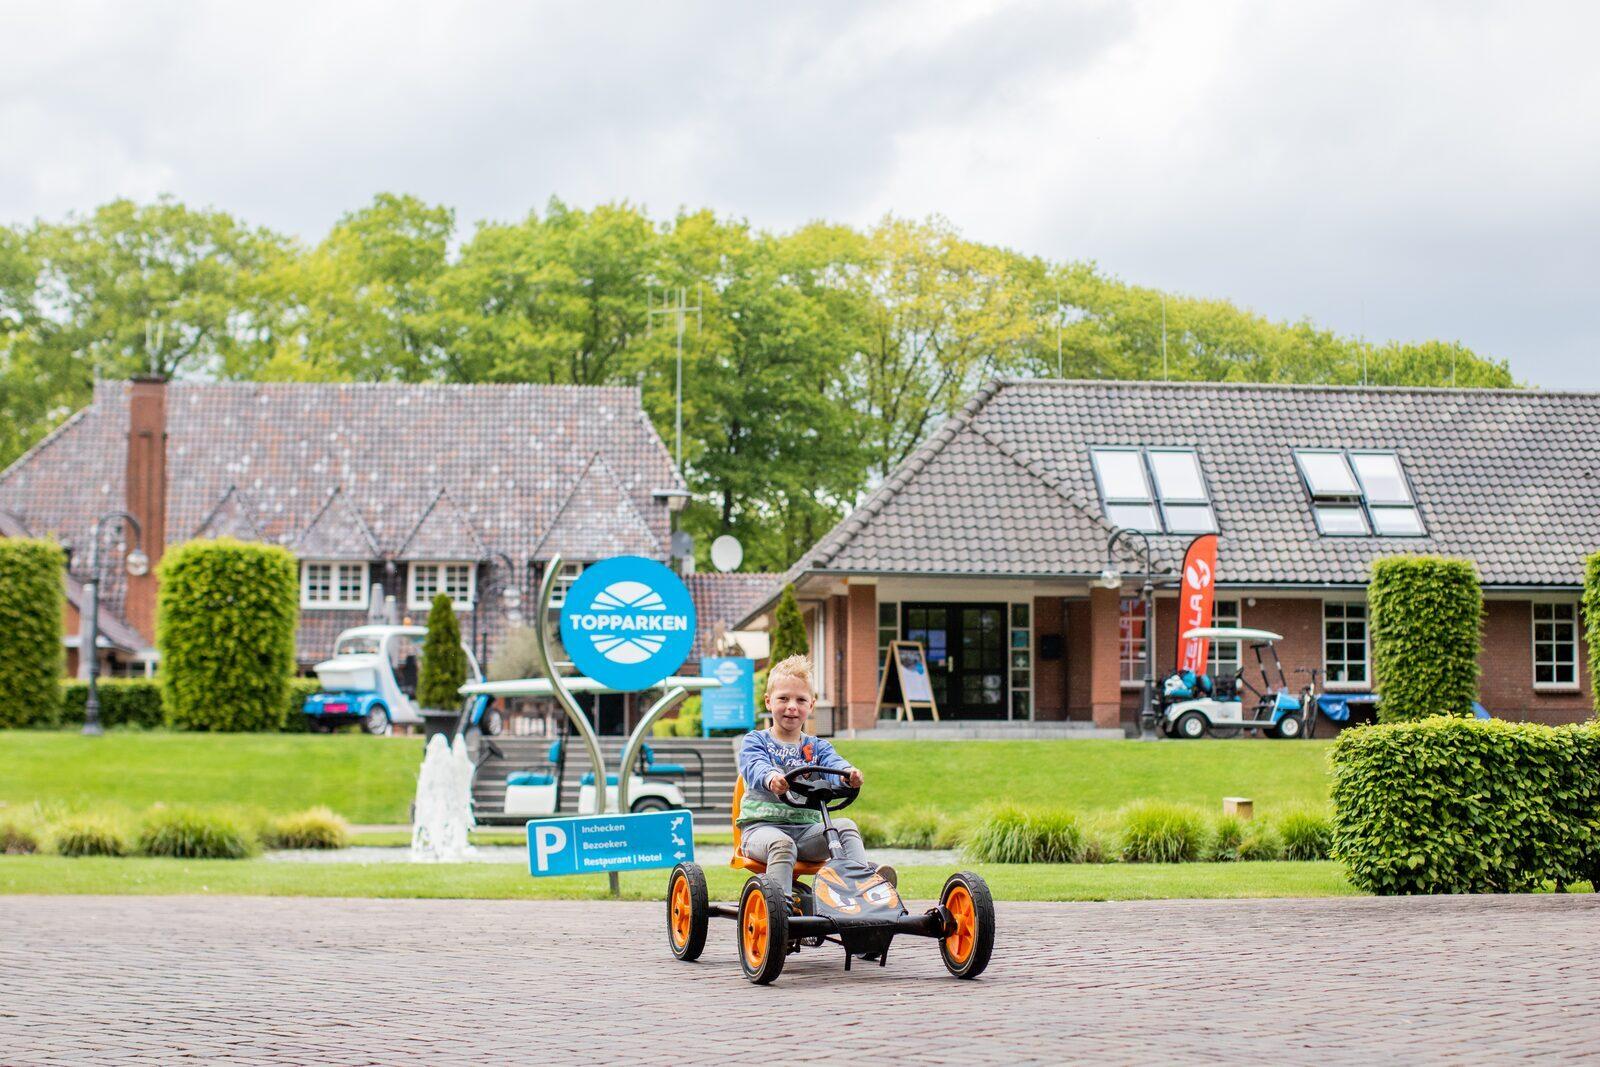 La location de go-karts à Landgoed de Scheleberg